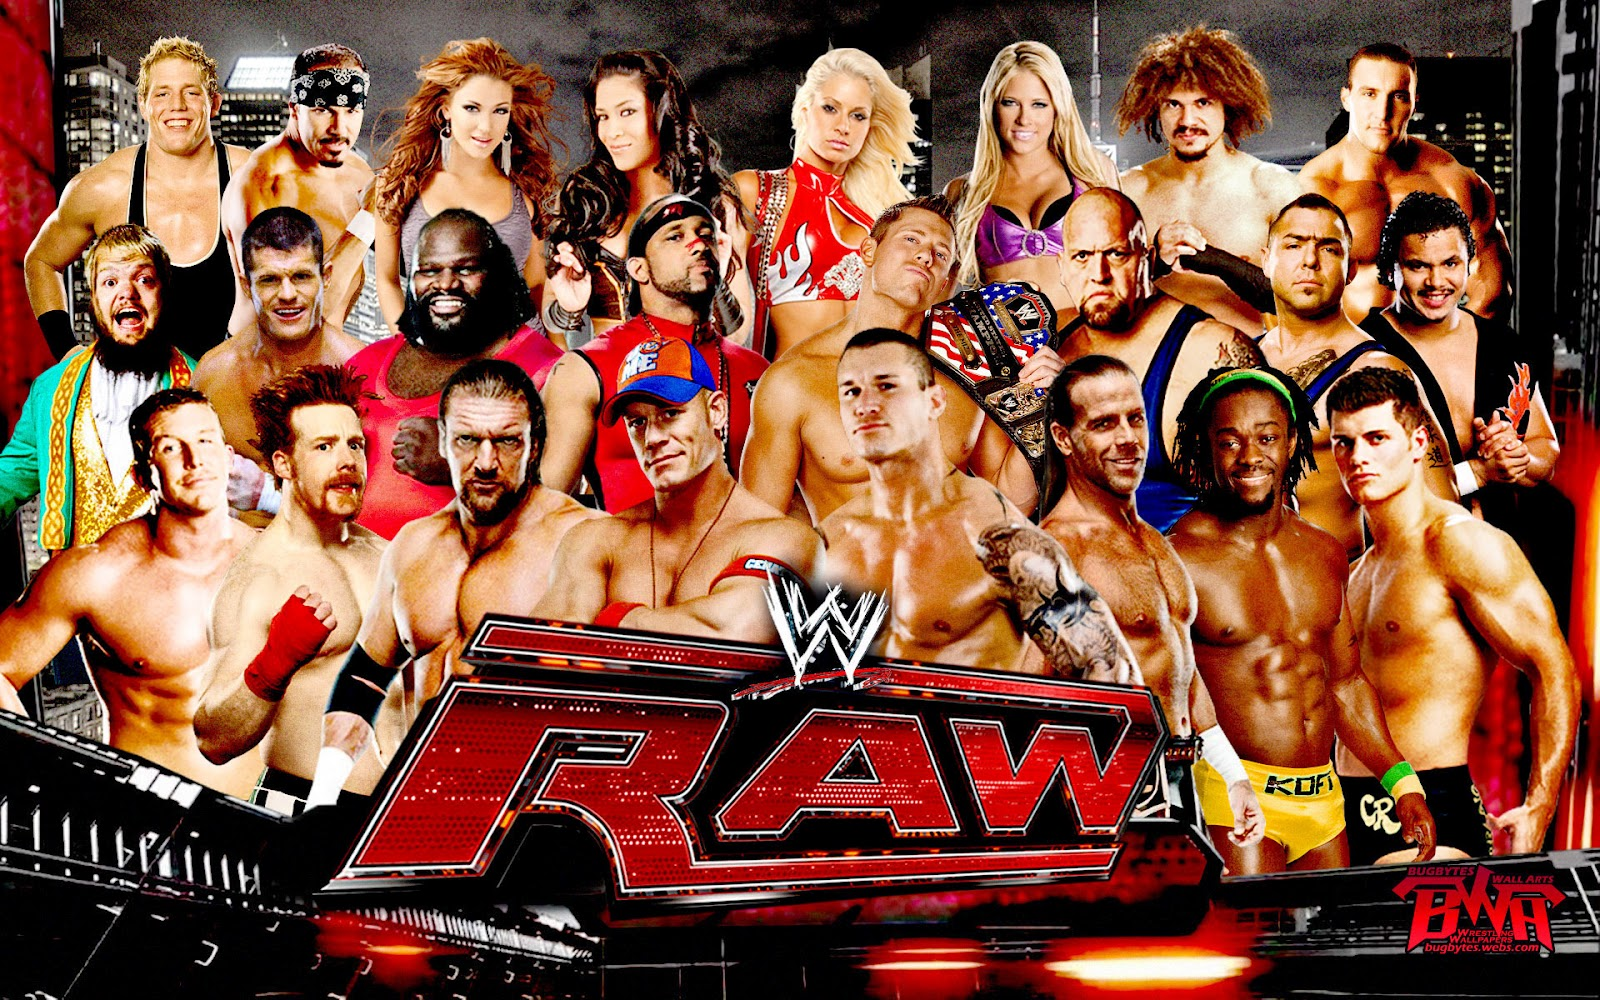 Wrestling Videos: WWE Raw - 4/30/2012 - 30th April 2012 - Download(MP4 ...